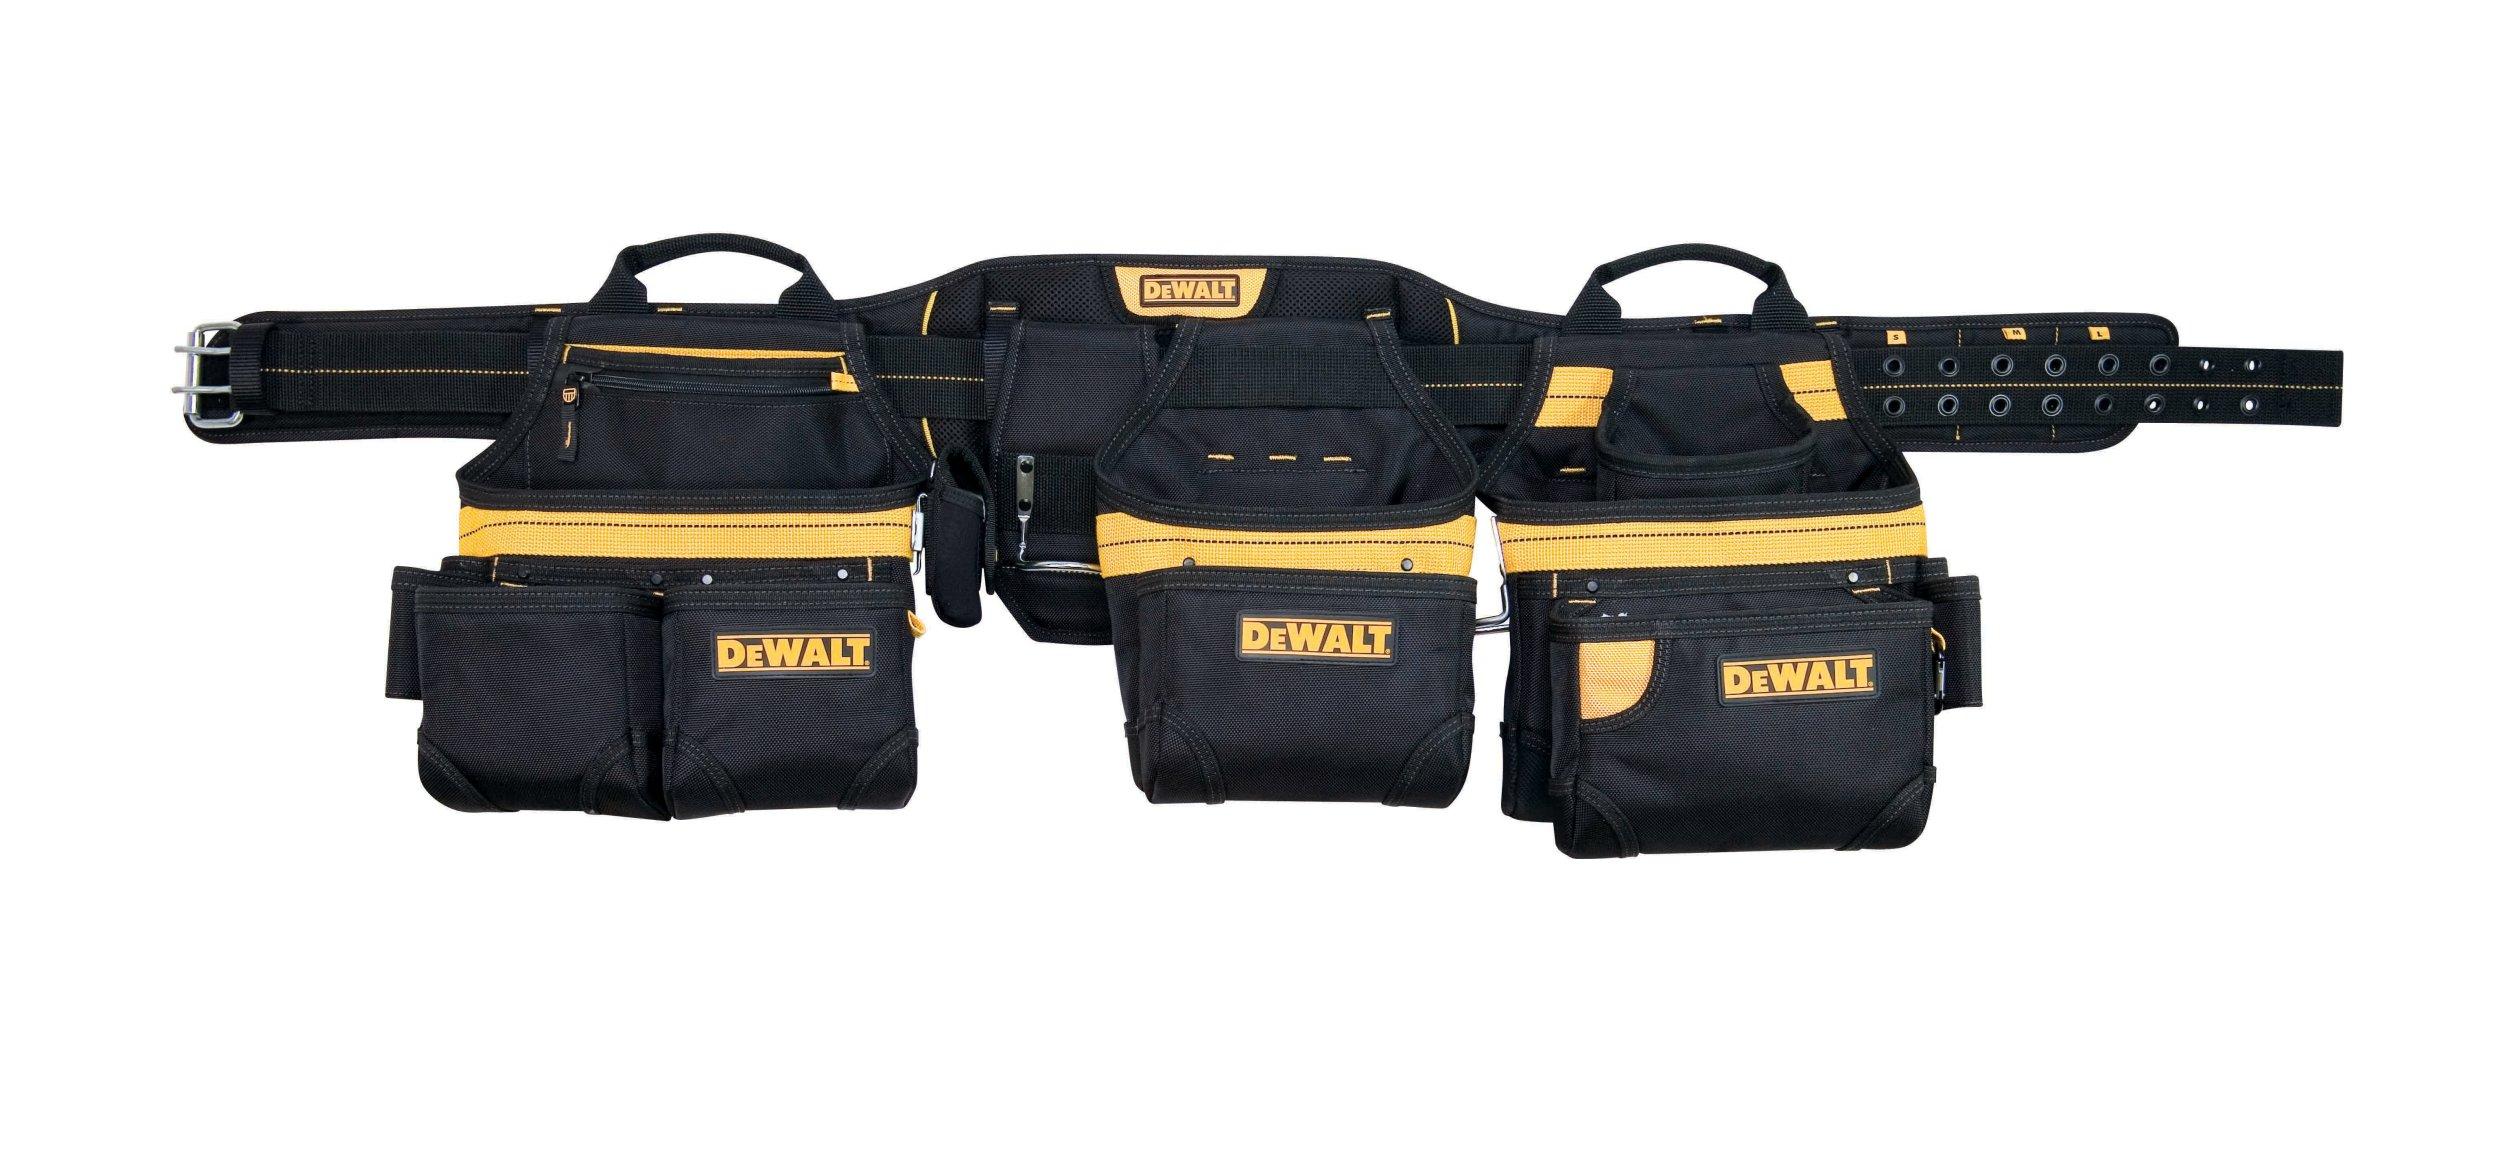 DEWALT DG5650 31-Pocket Professional Carpenter's Pro-combo Apron Tool Belt by DEWALT